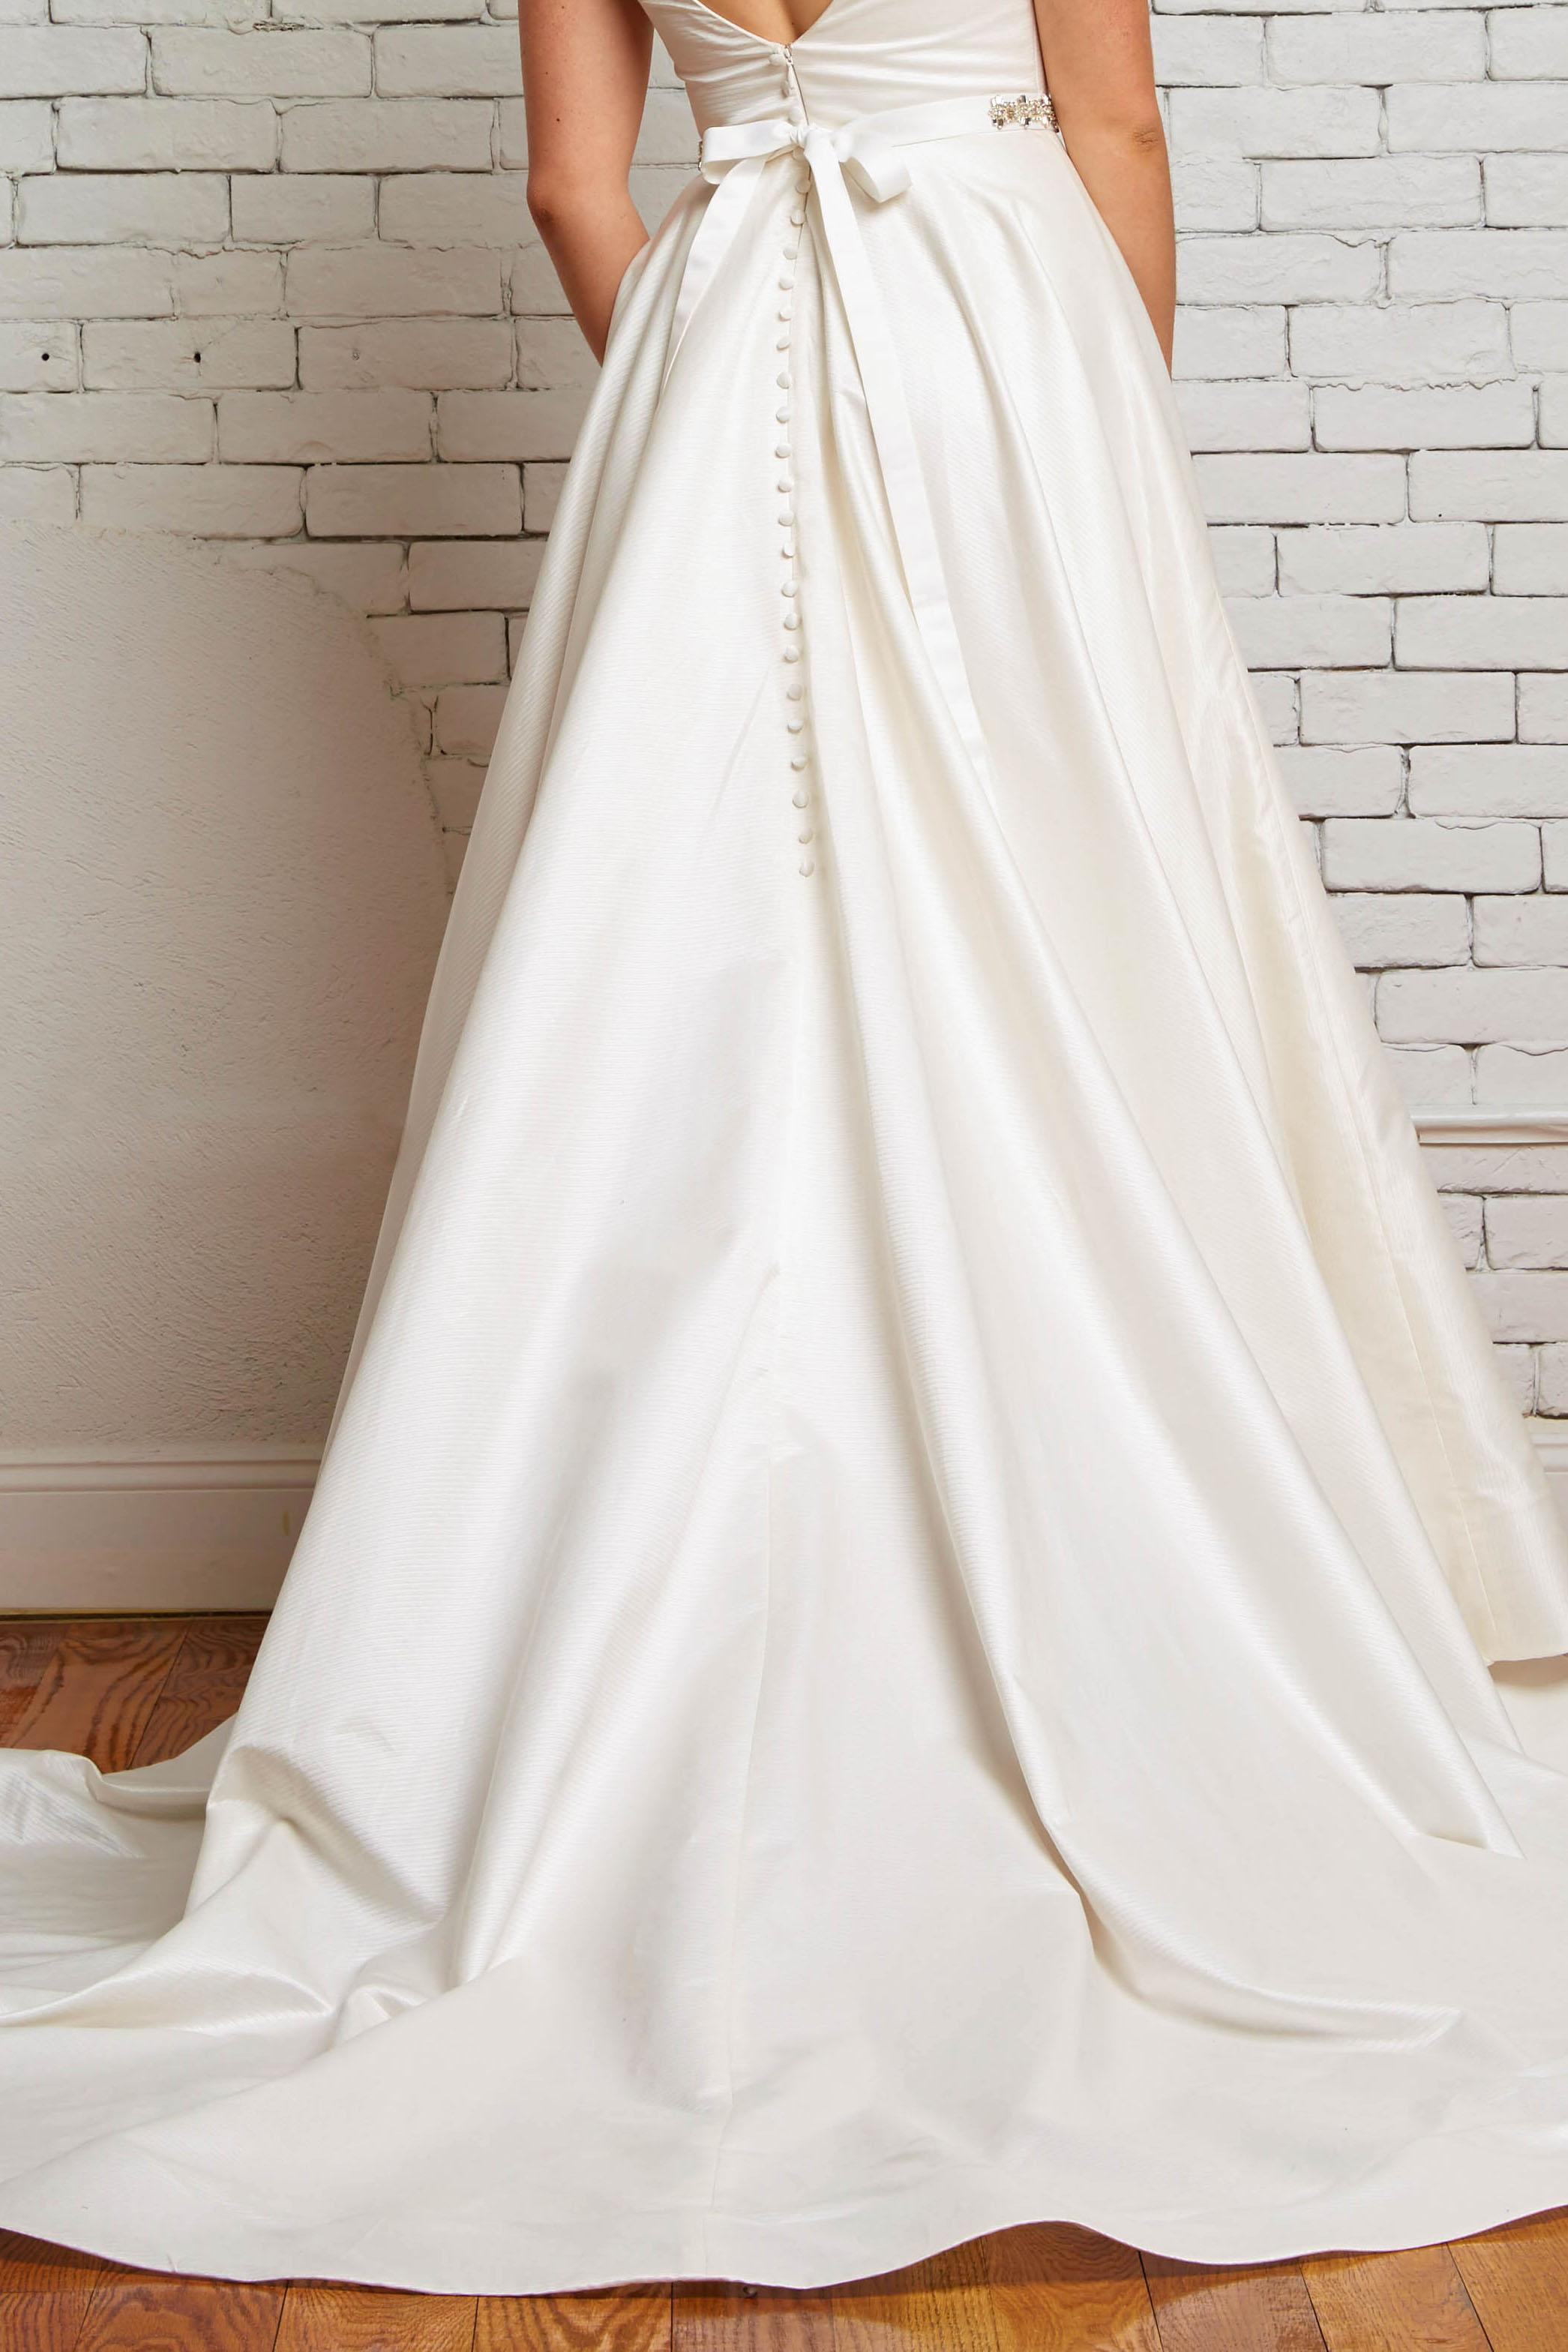 10D London Back-Rebecca Schoneveld-Satin_V-neck_Simplicity_Modern_Wedding_Ballgown.jpg